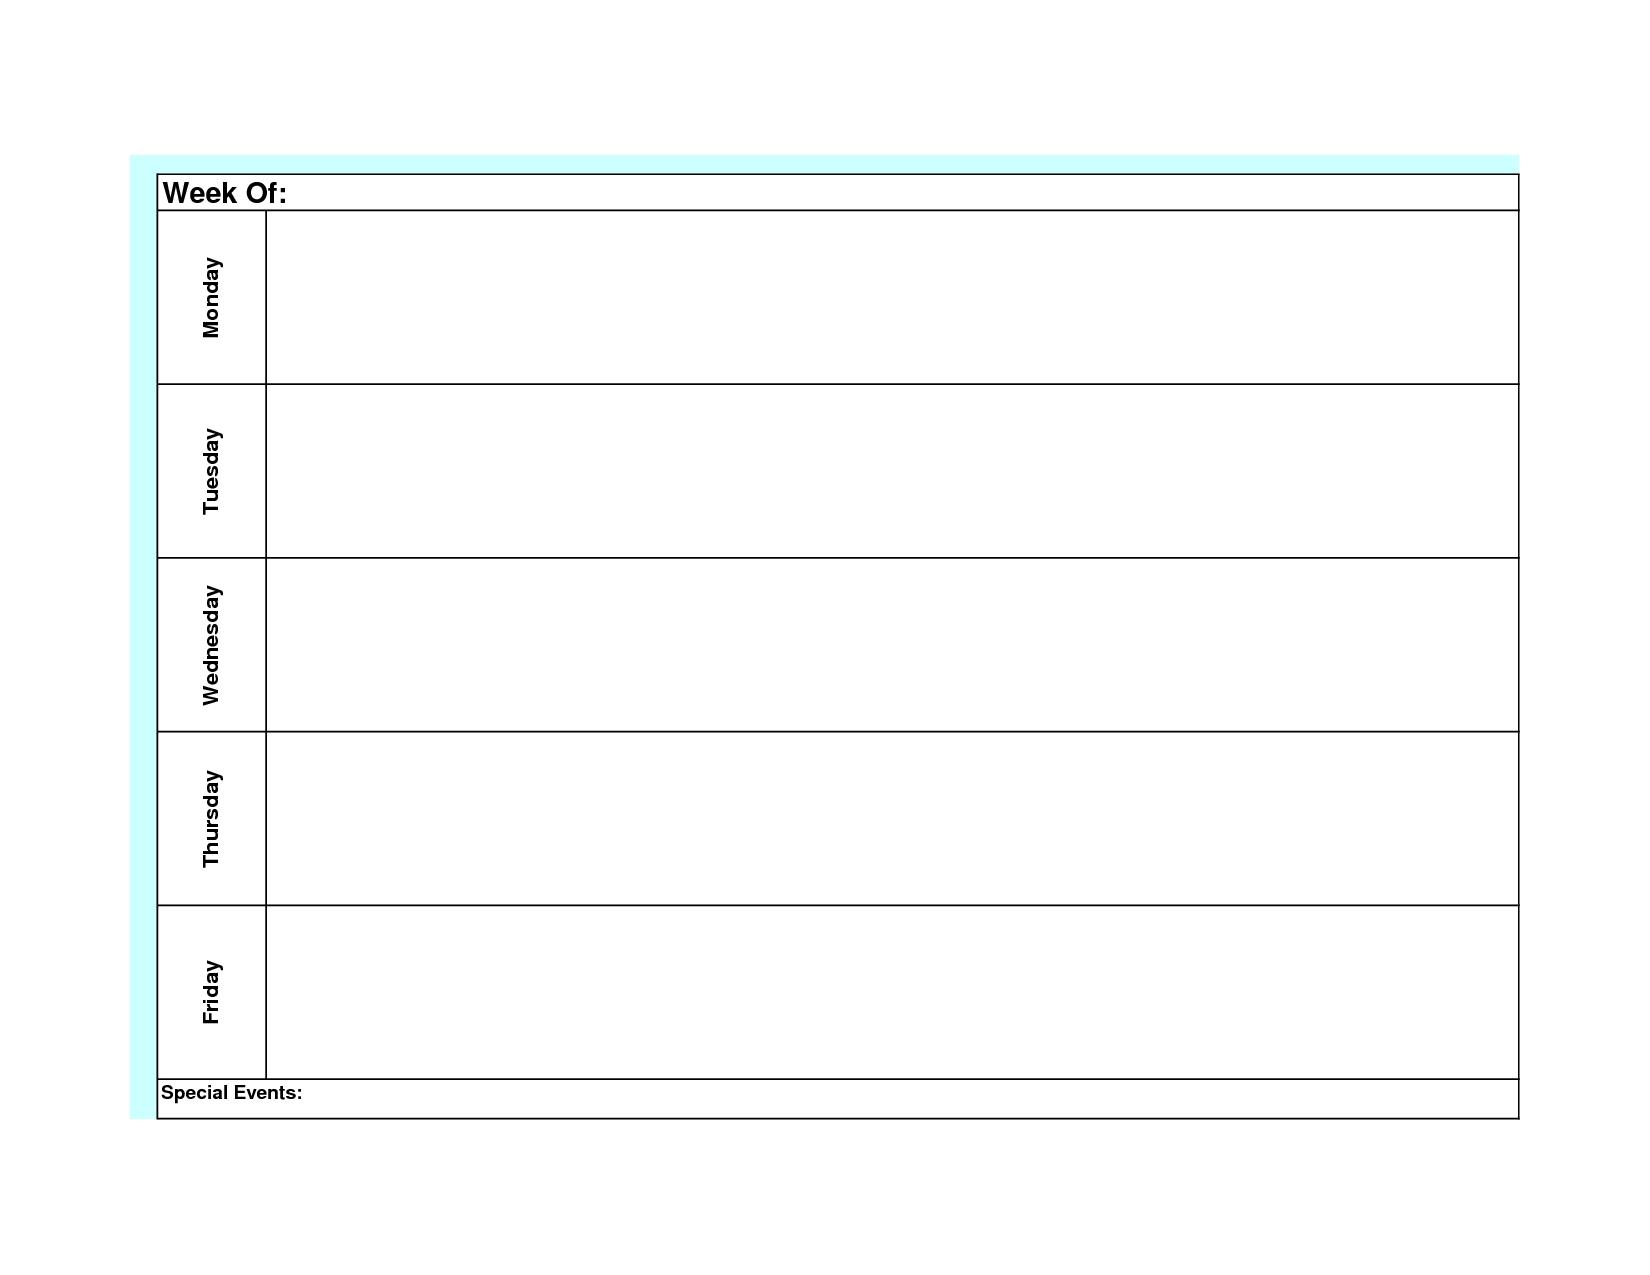 Blank Weekly Calendar Template Monday Friday | Weekly-Monday To Friday Template